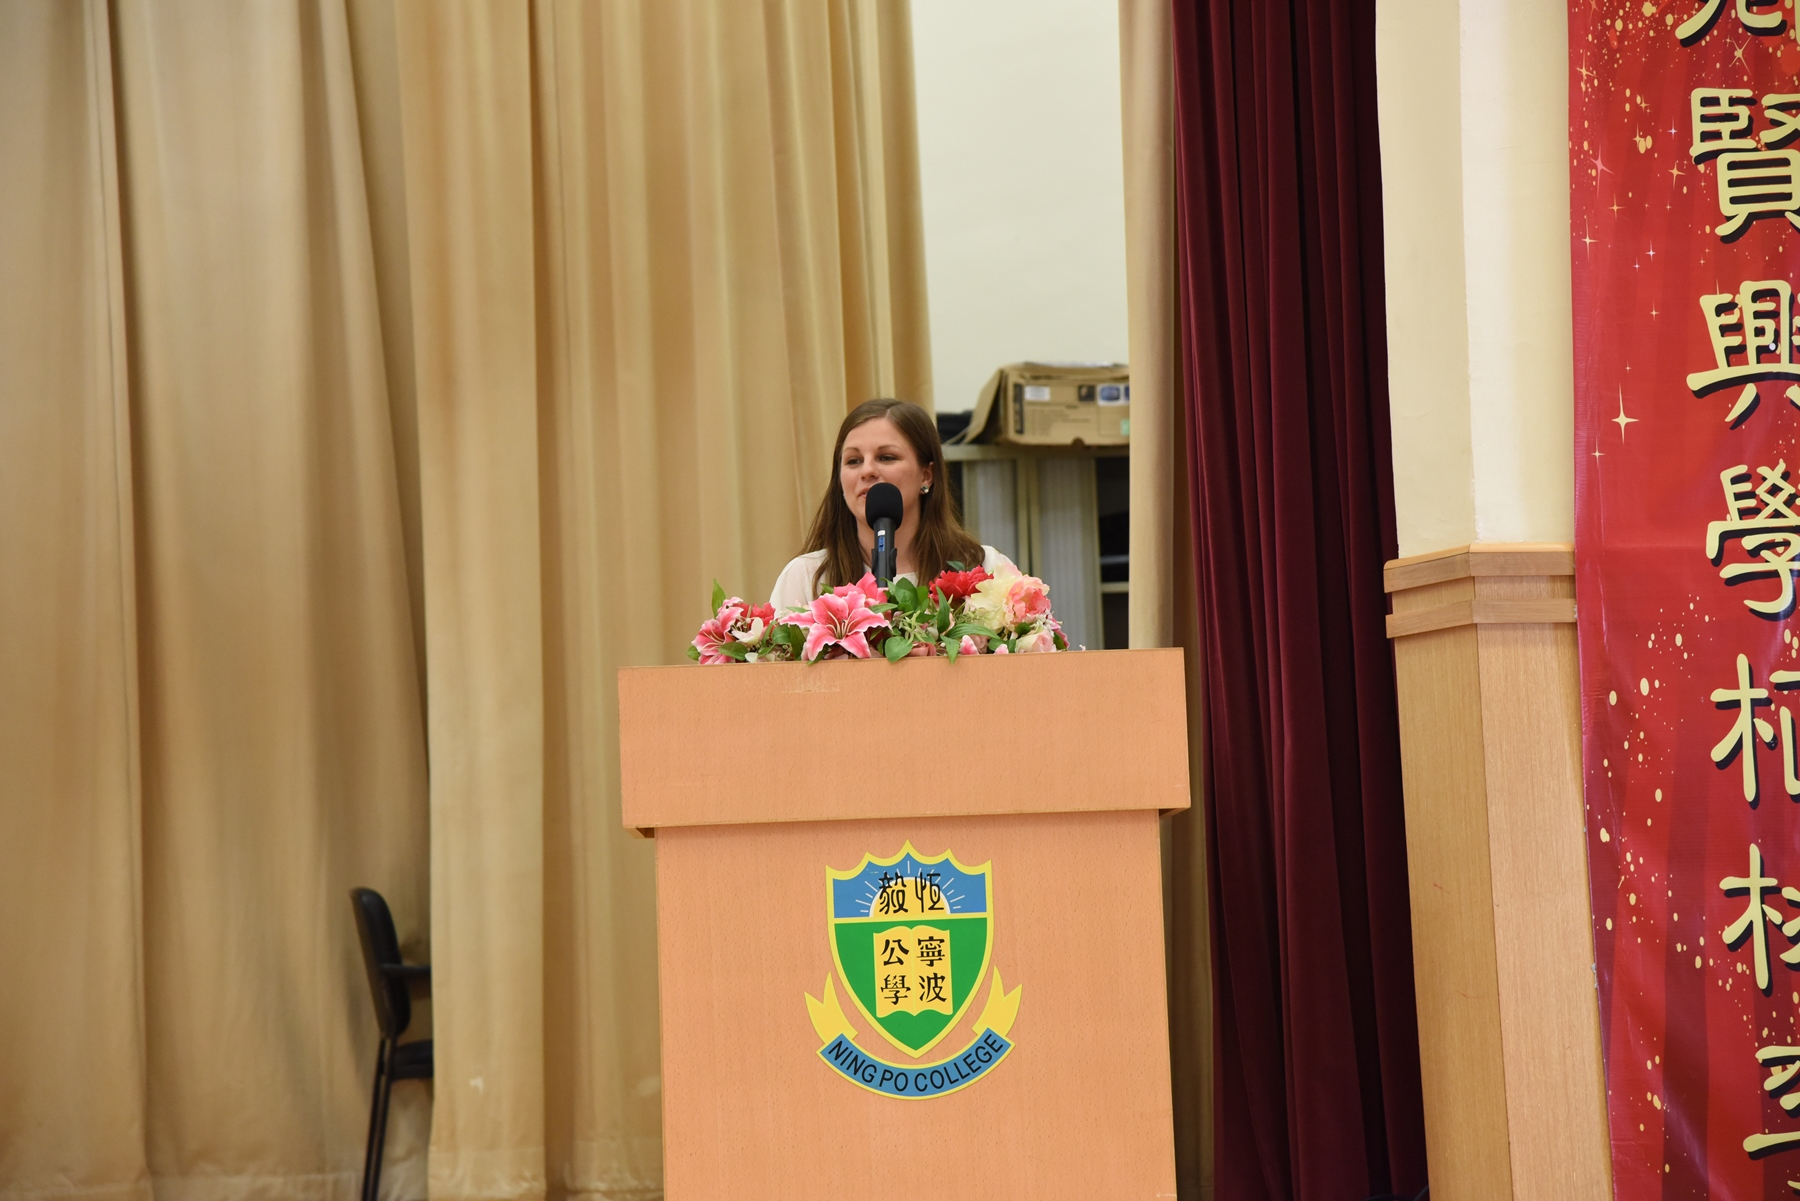 http://www.npc.edu.hk/sites/default/files/dsc_0181_1.jpg